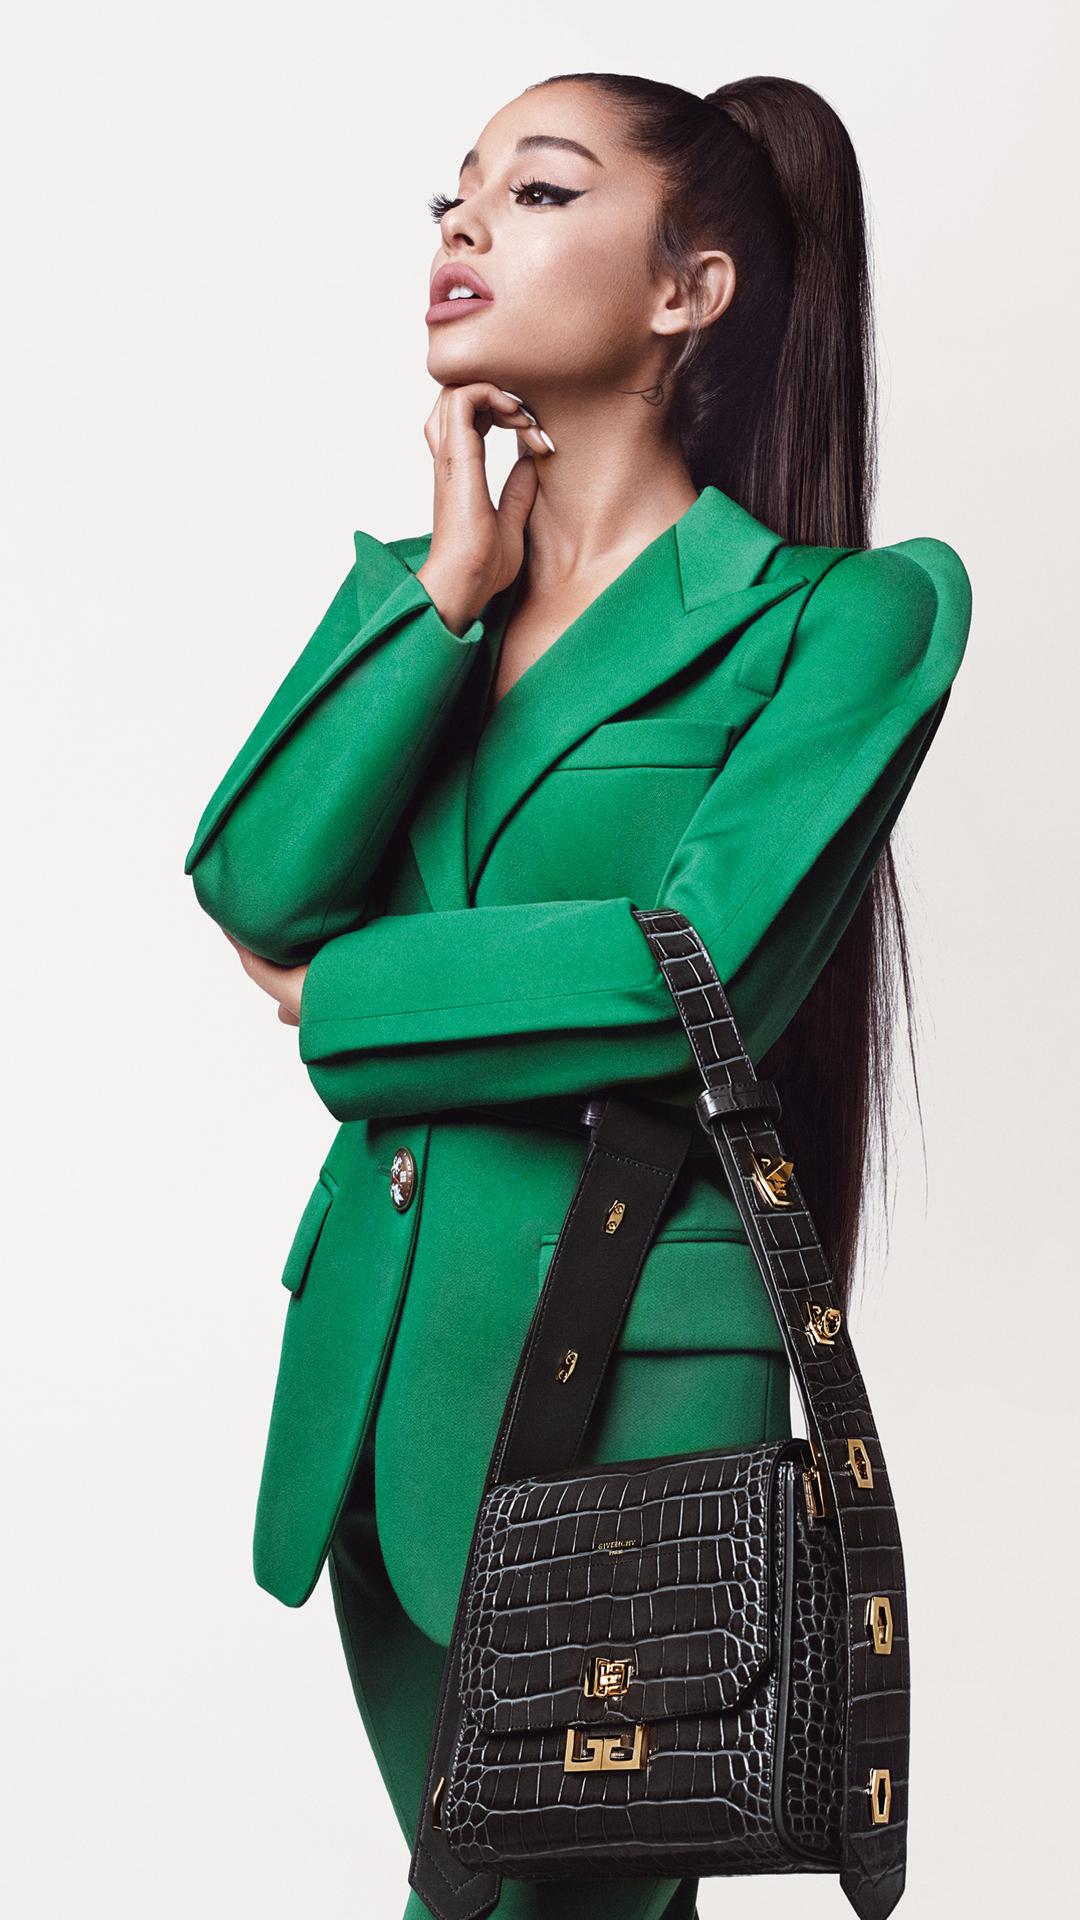 Ariana Grande For Givenchy FW19